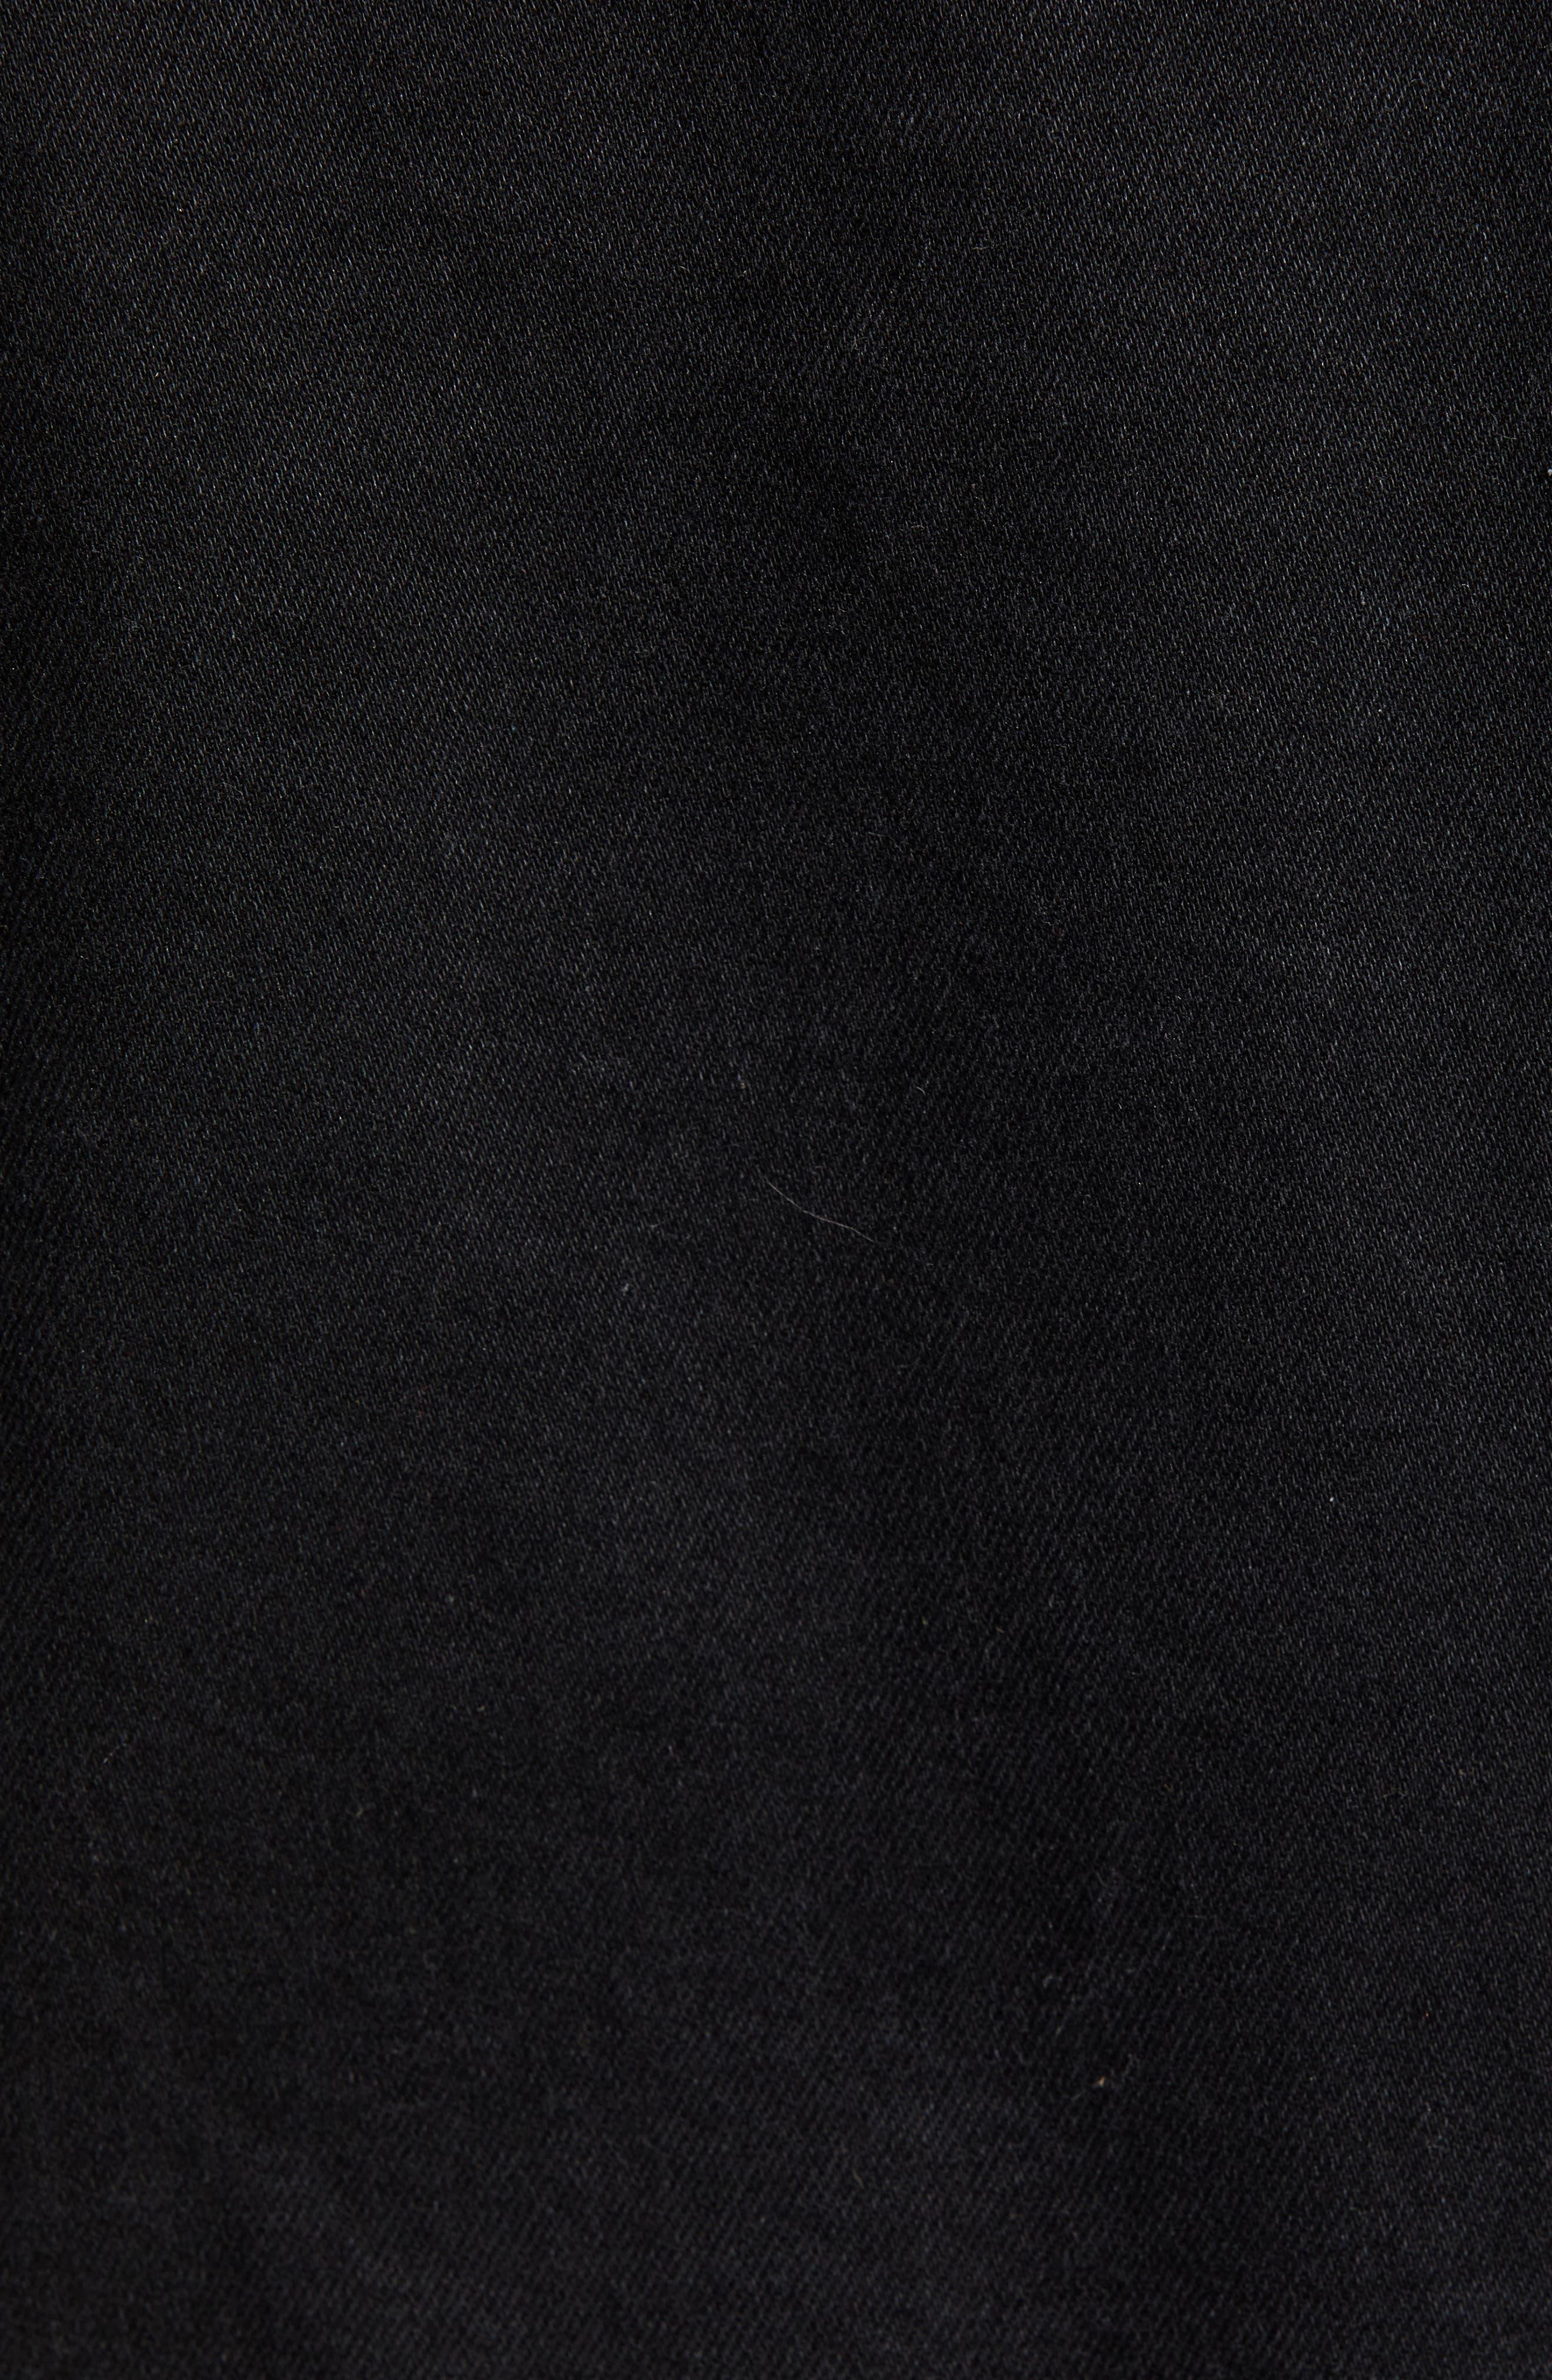 Polara Denim Jacket,                             Alternate thumbnail 7, color,                             WASHED BLACK